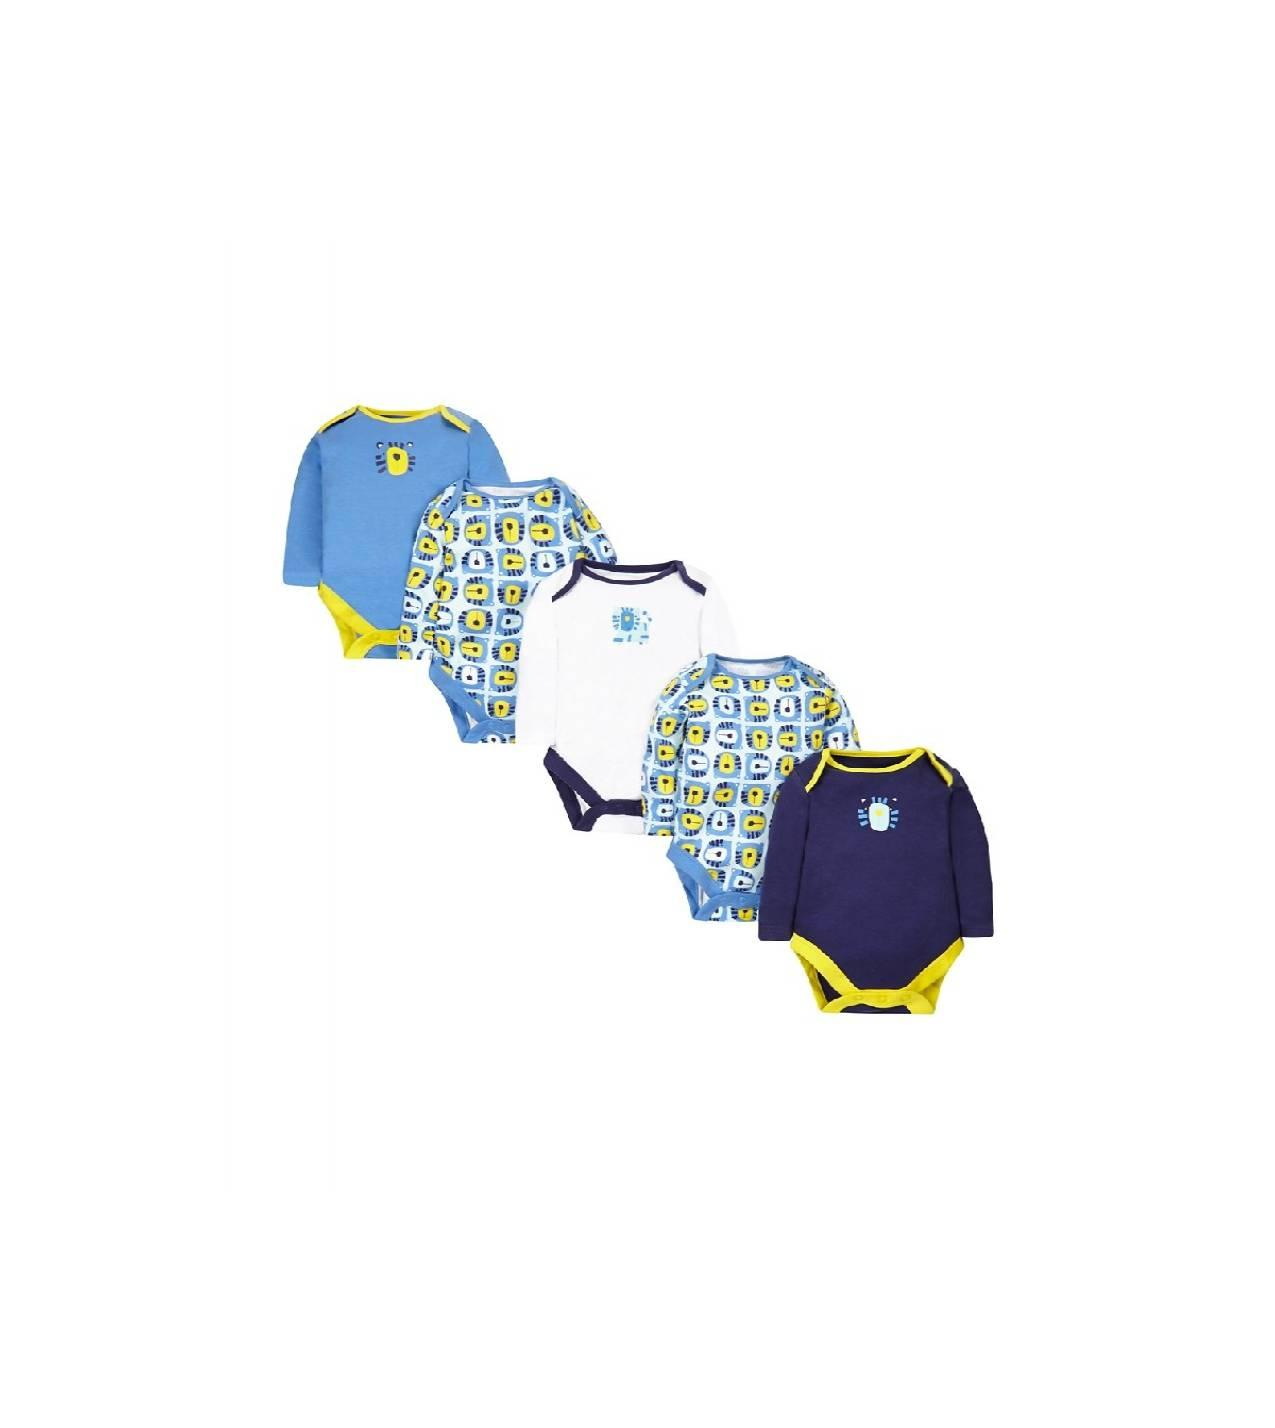 Mothercare Longsleeves Bodysuits 5 pack - 18-24 Bulan, Hitam